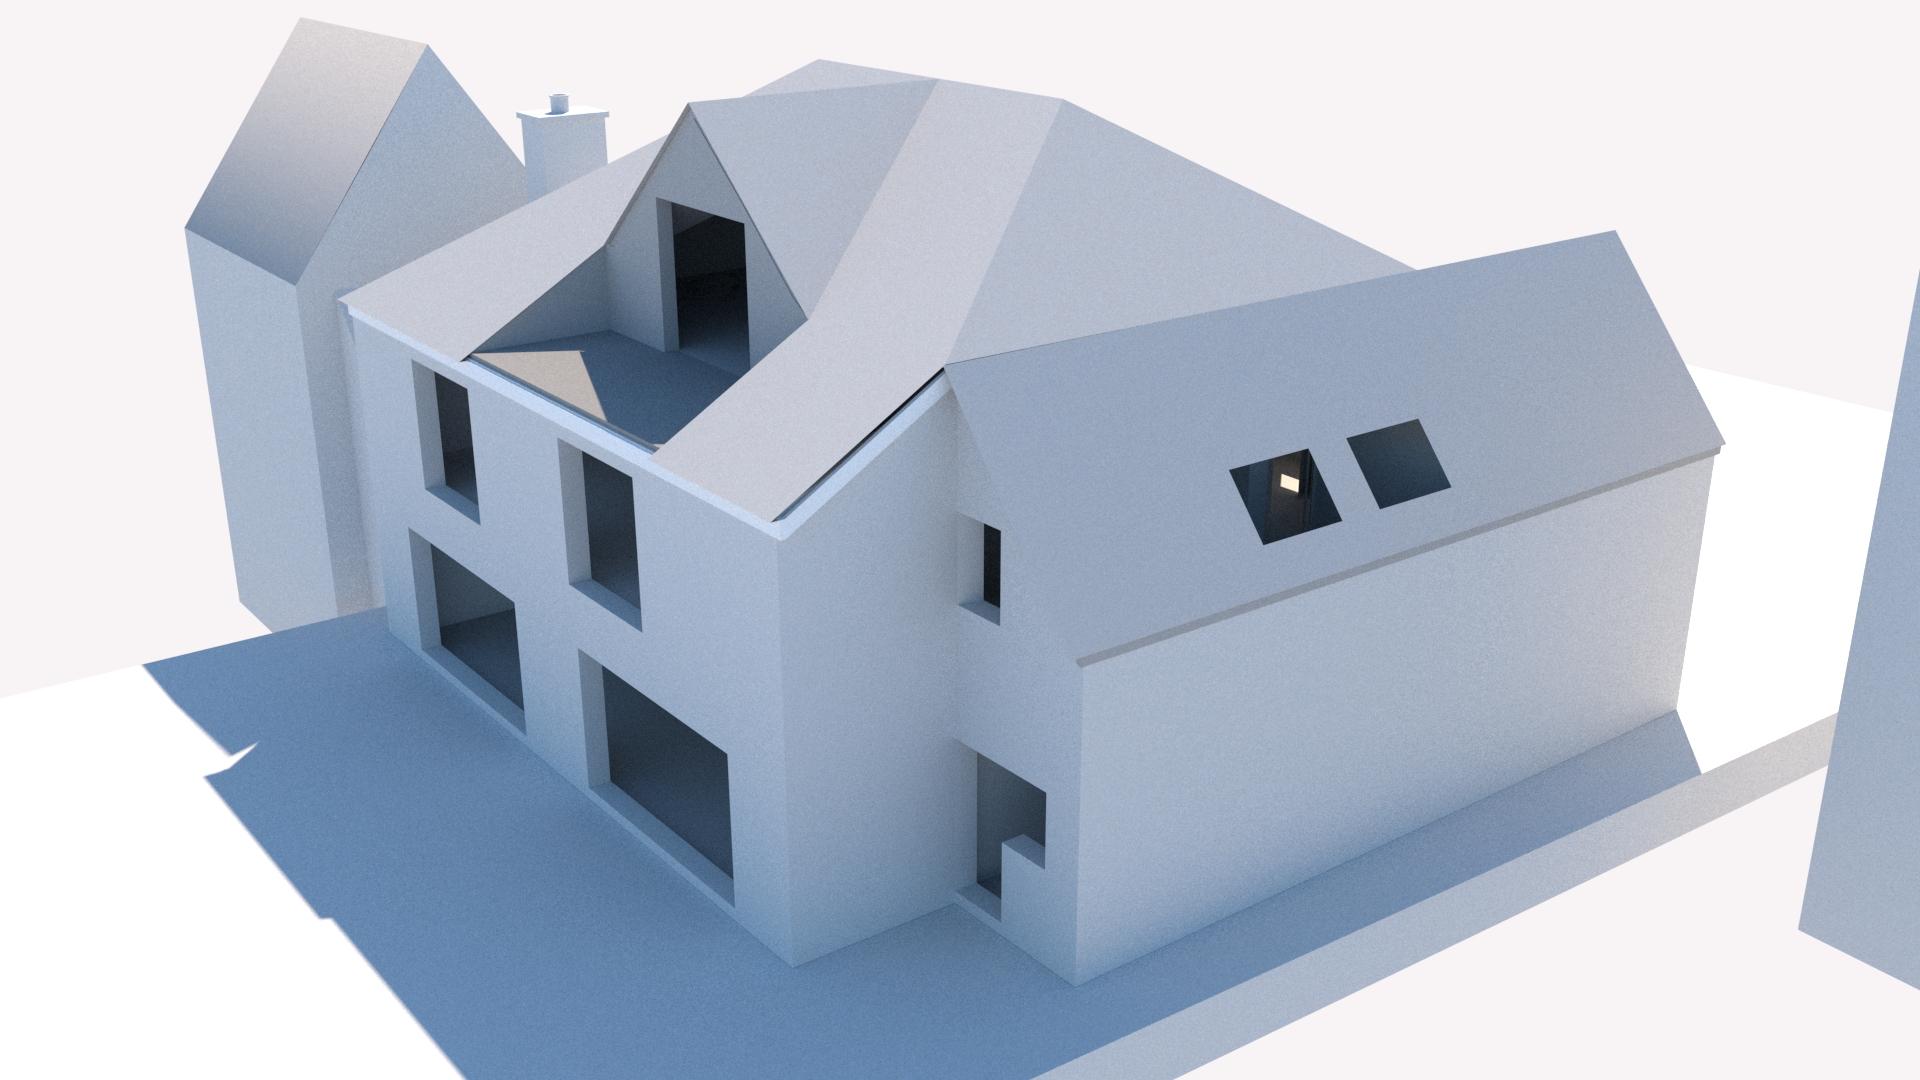 3d architects model CGI rendering